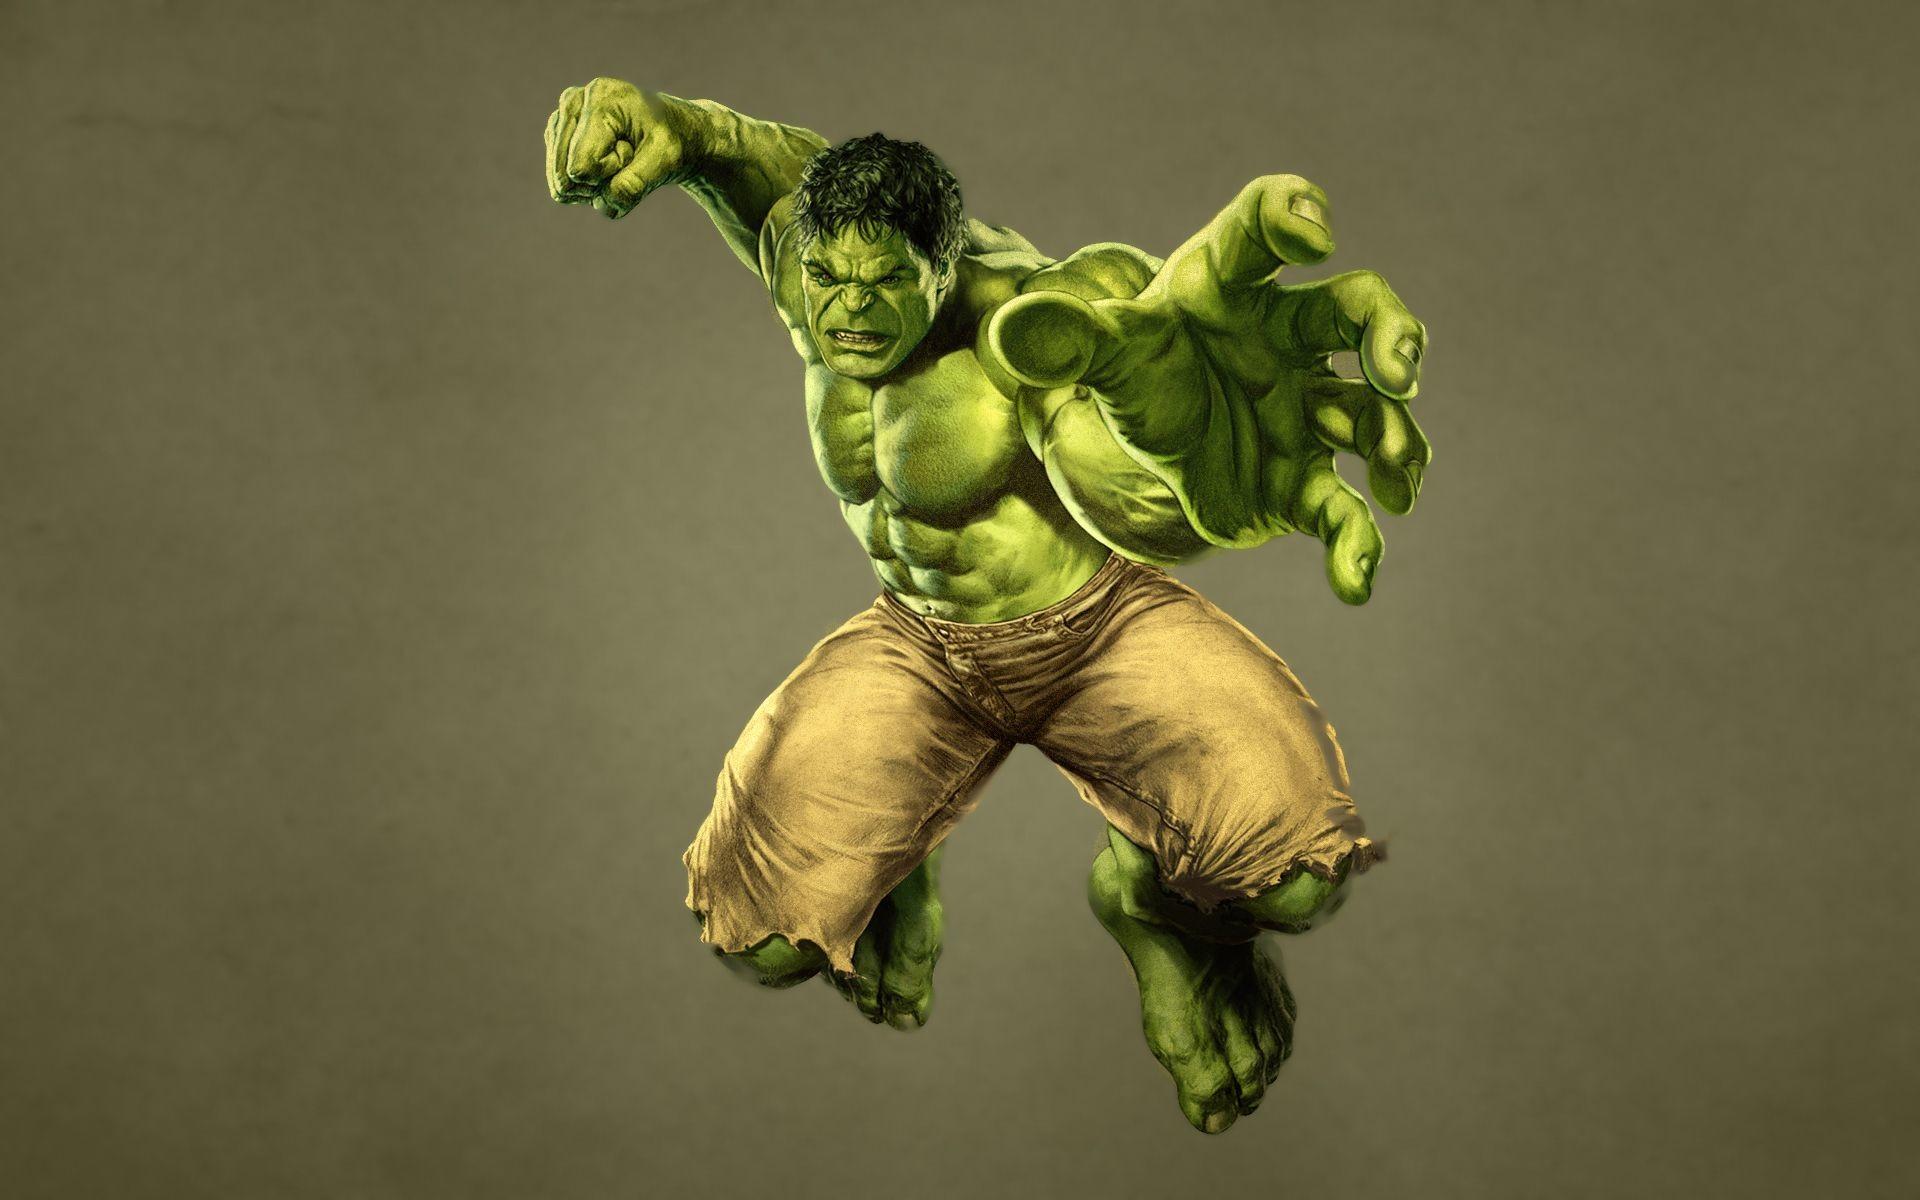 HD Hulk Wallpaper: HD Incredible hulk Wallpapers Pictures Photos .